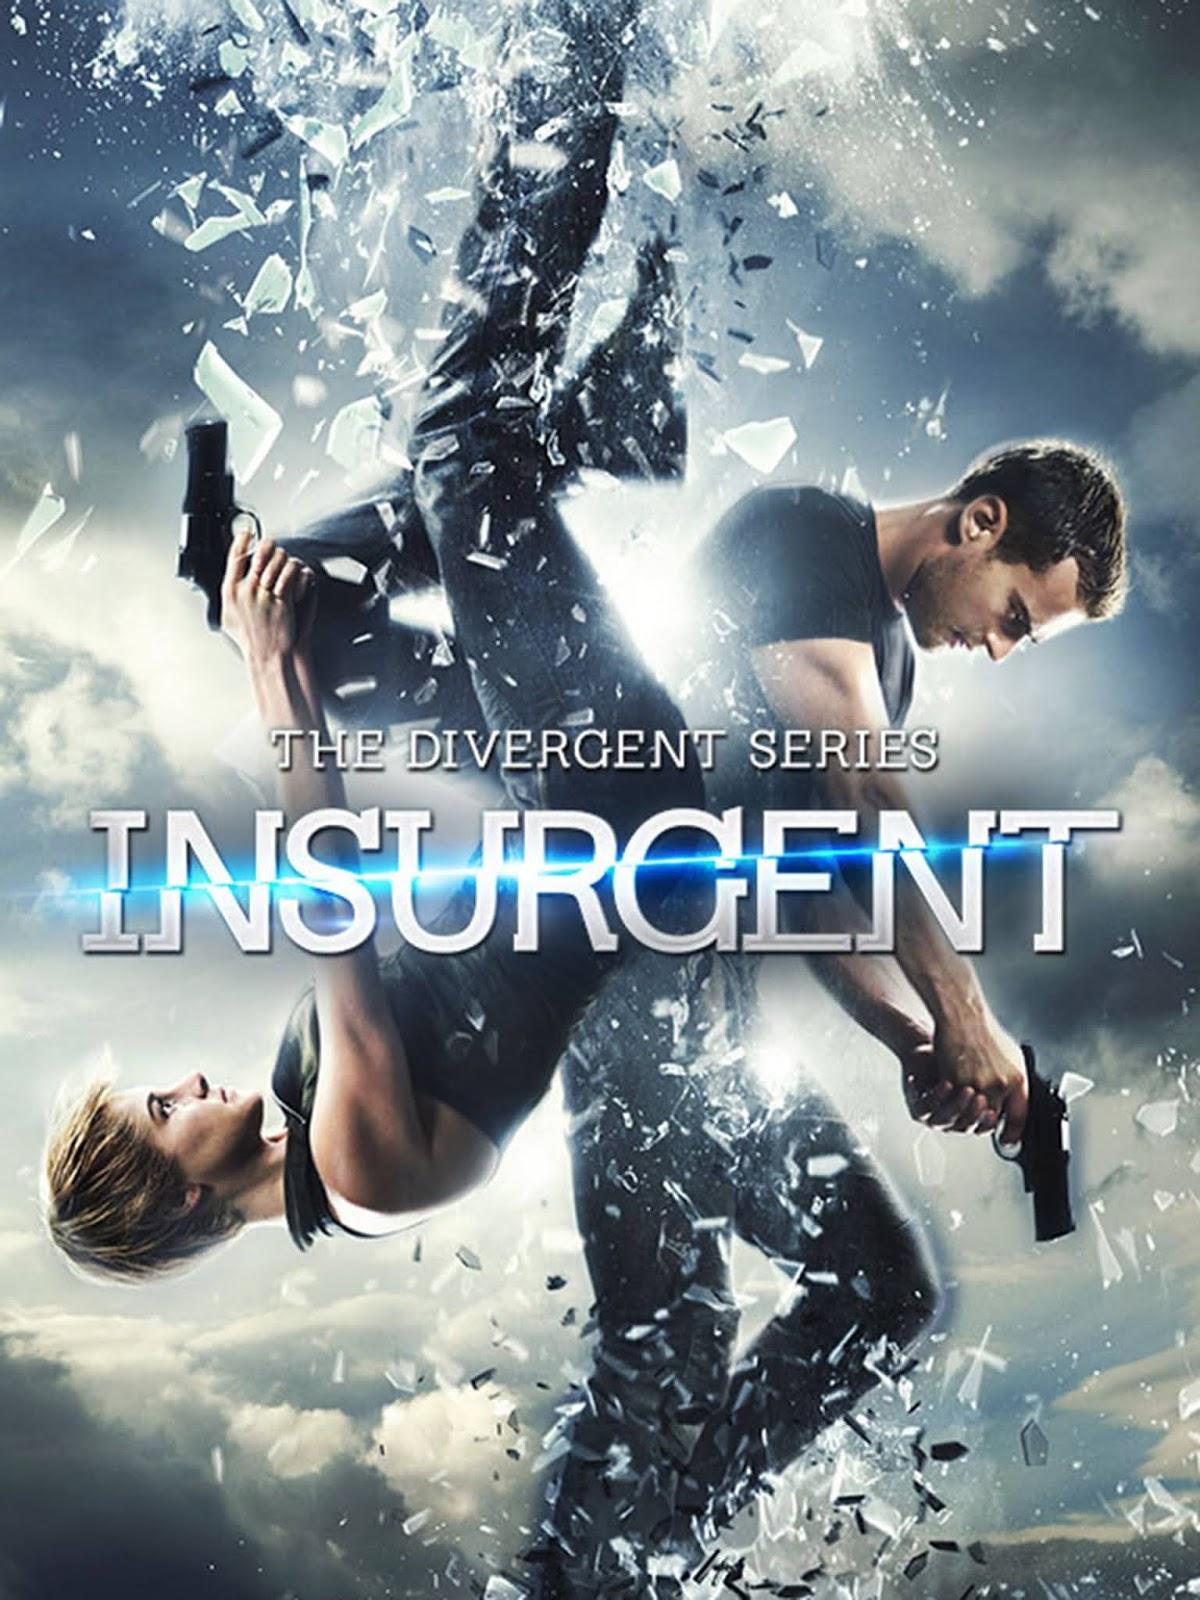 Insurgent (2015) Dual Audio Hindi English 720p BluRay Full Movie Free Download